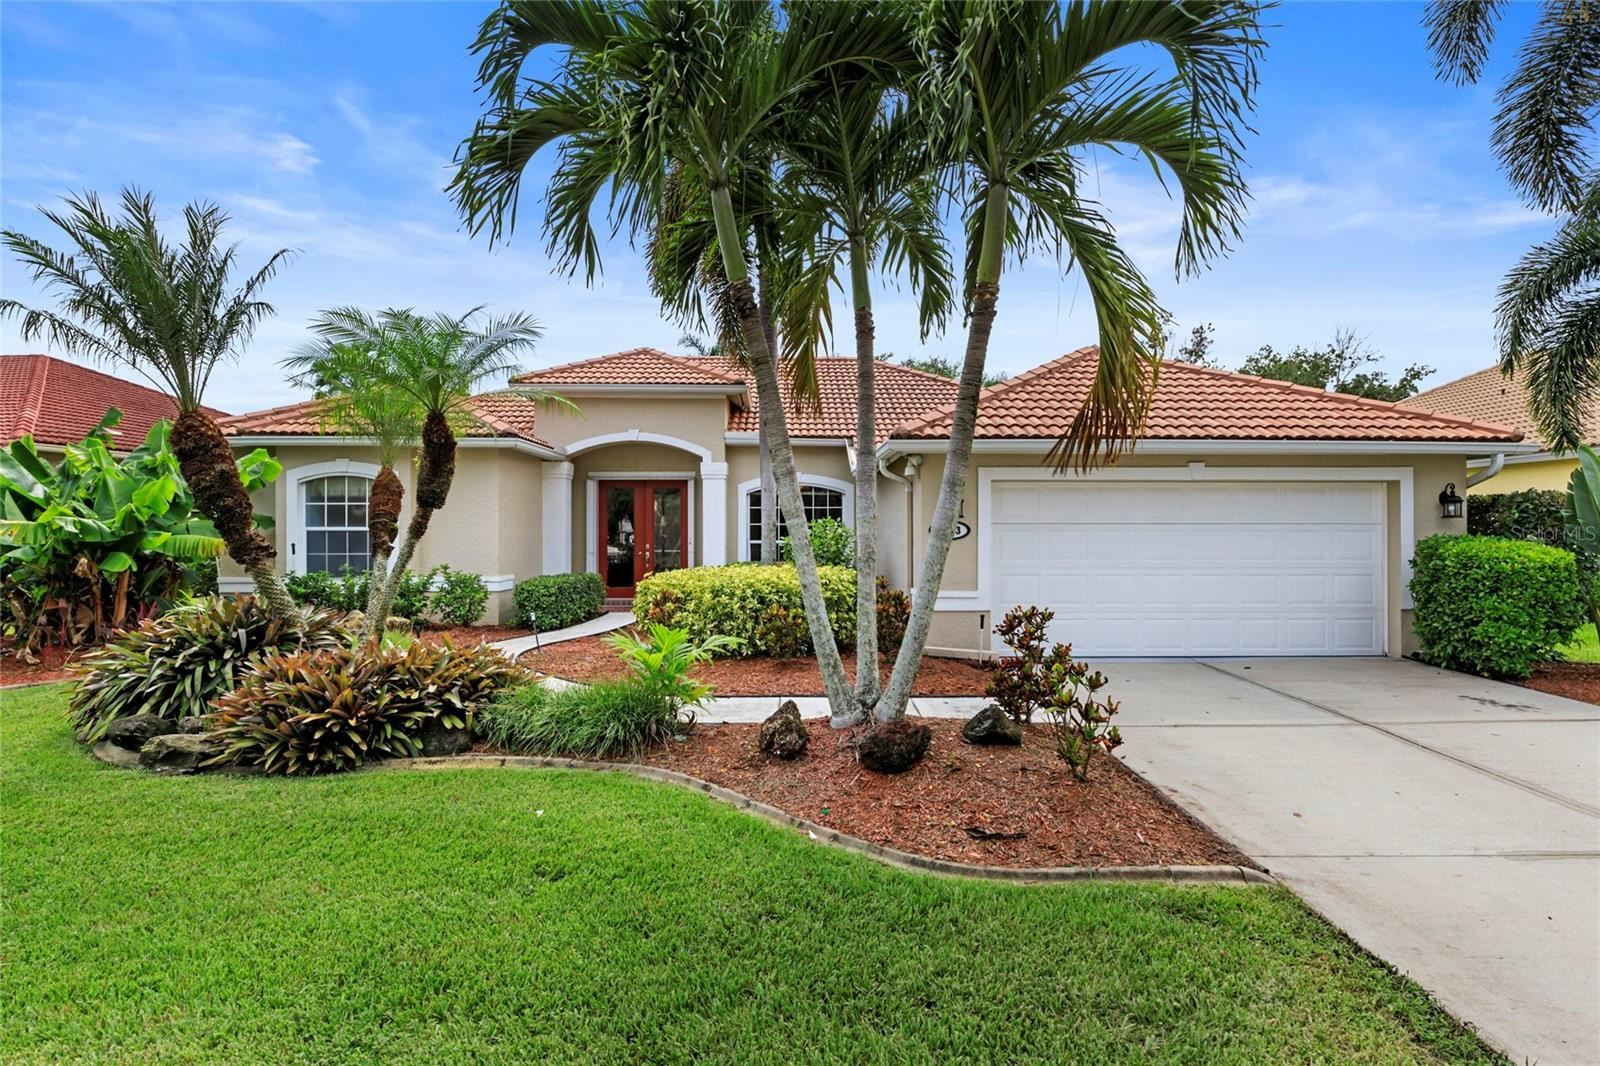 4633 SWEETMEADOW CIRCLE, Sarasota, FL 34238 - #: A4512586